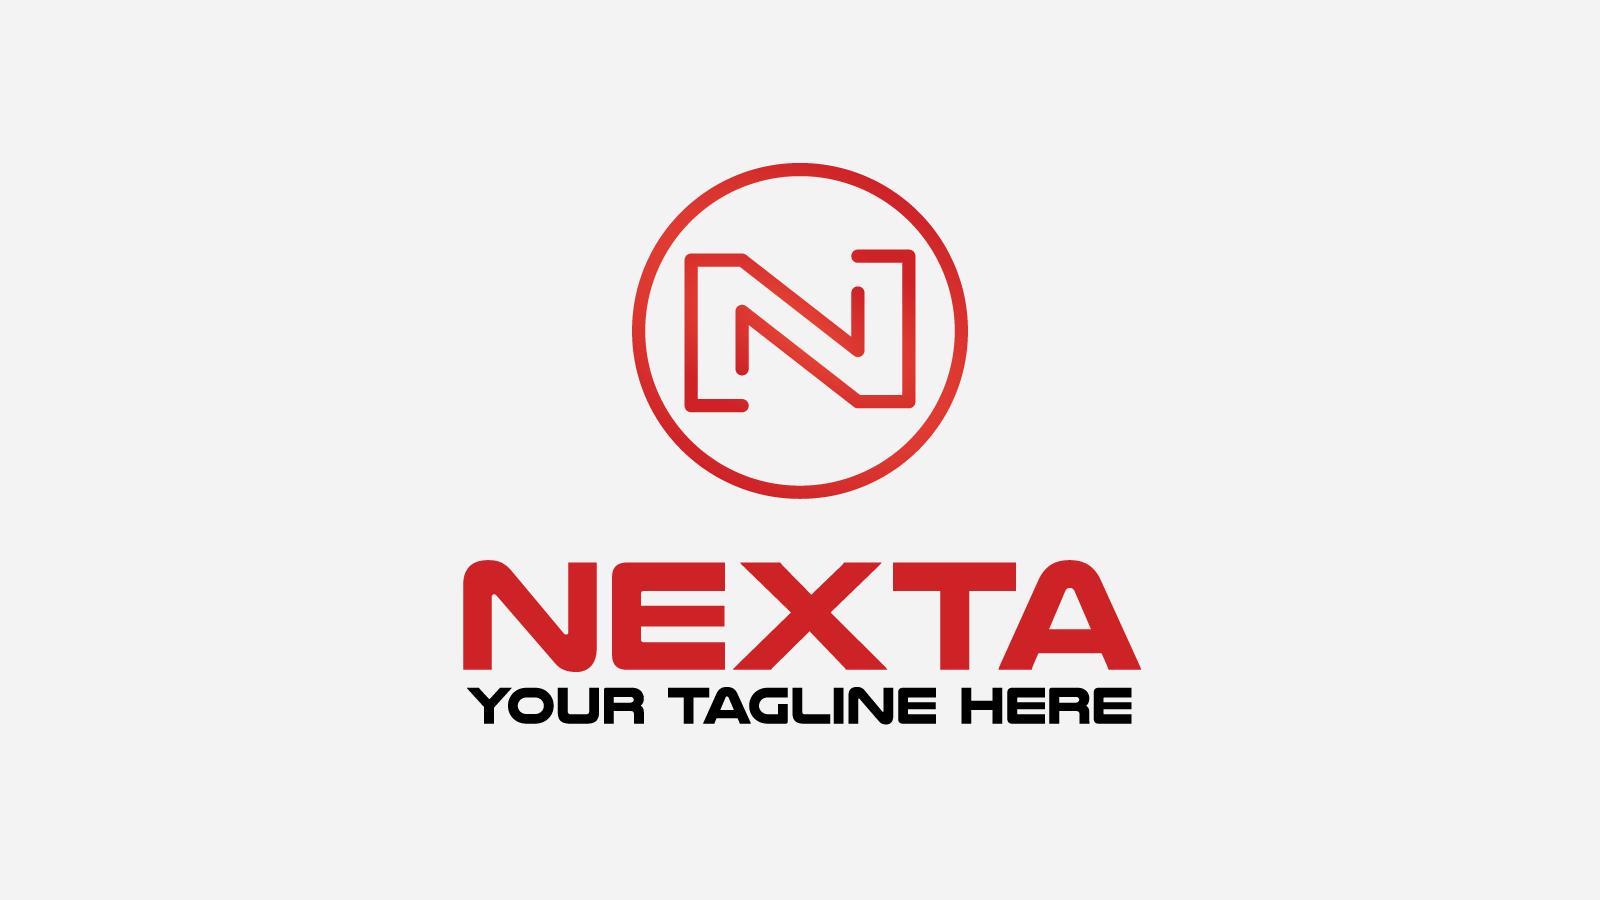 nexta free logo design zfreegraphic free vector logo downloads